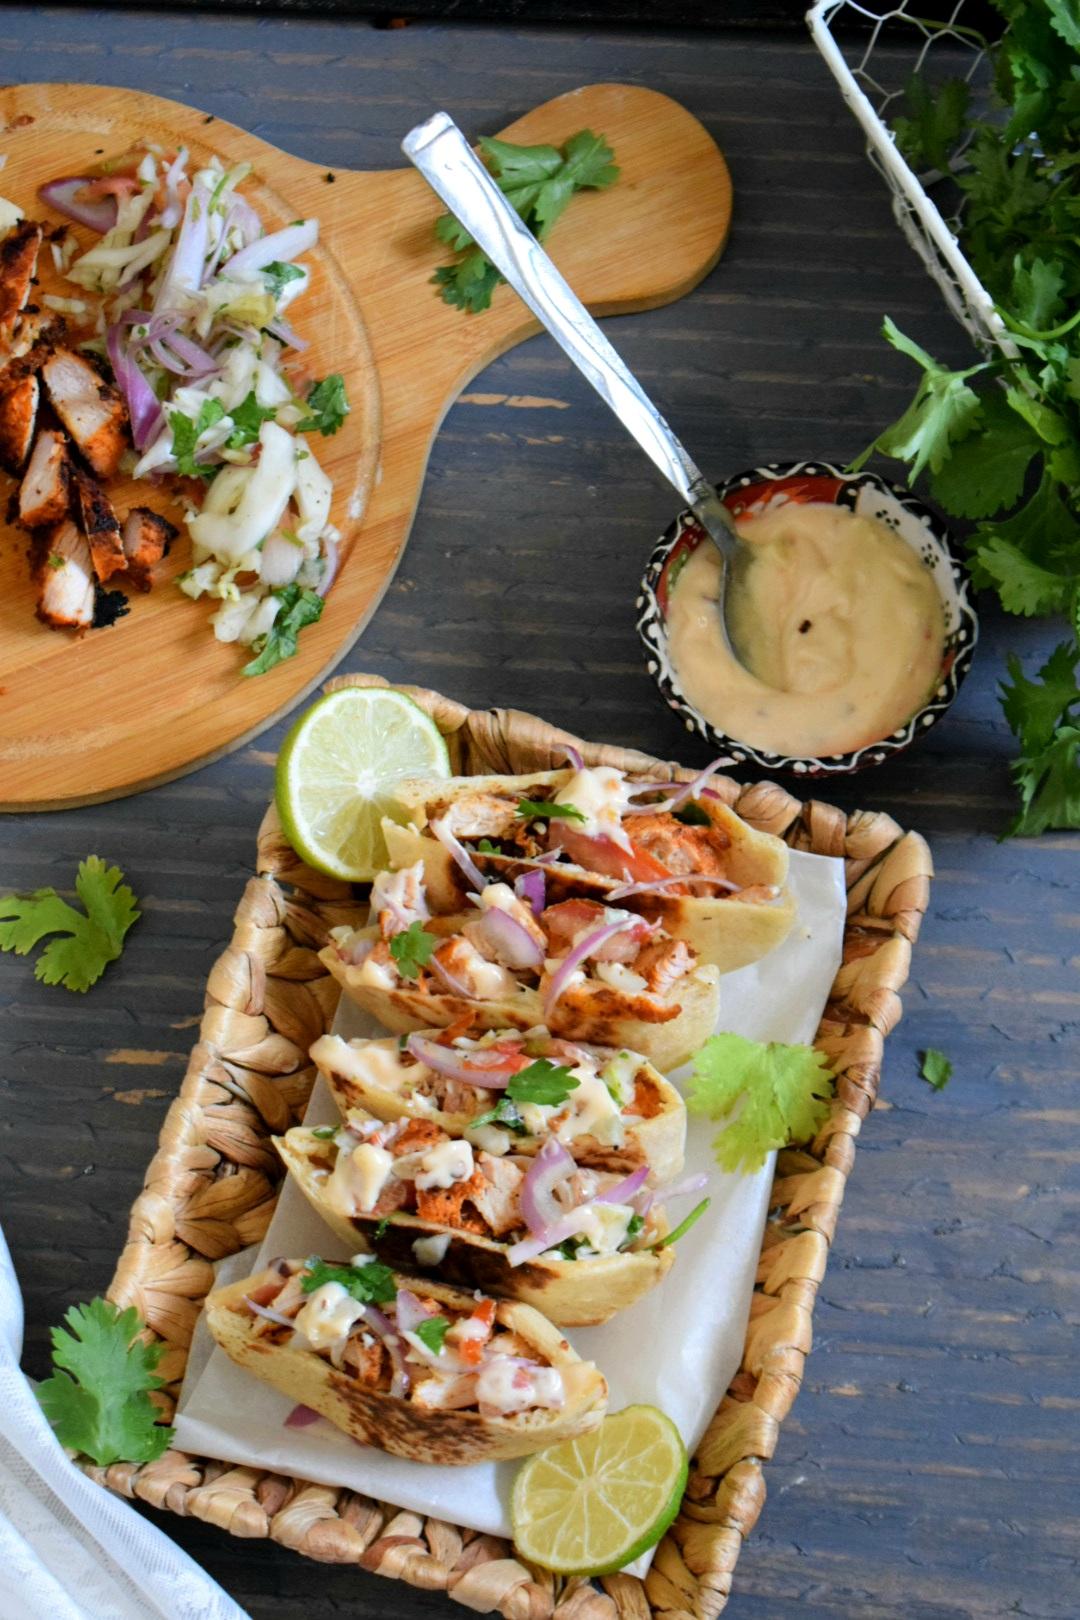 Pocket Shawarma / Grilled Chicken Shawarma